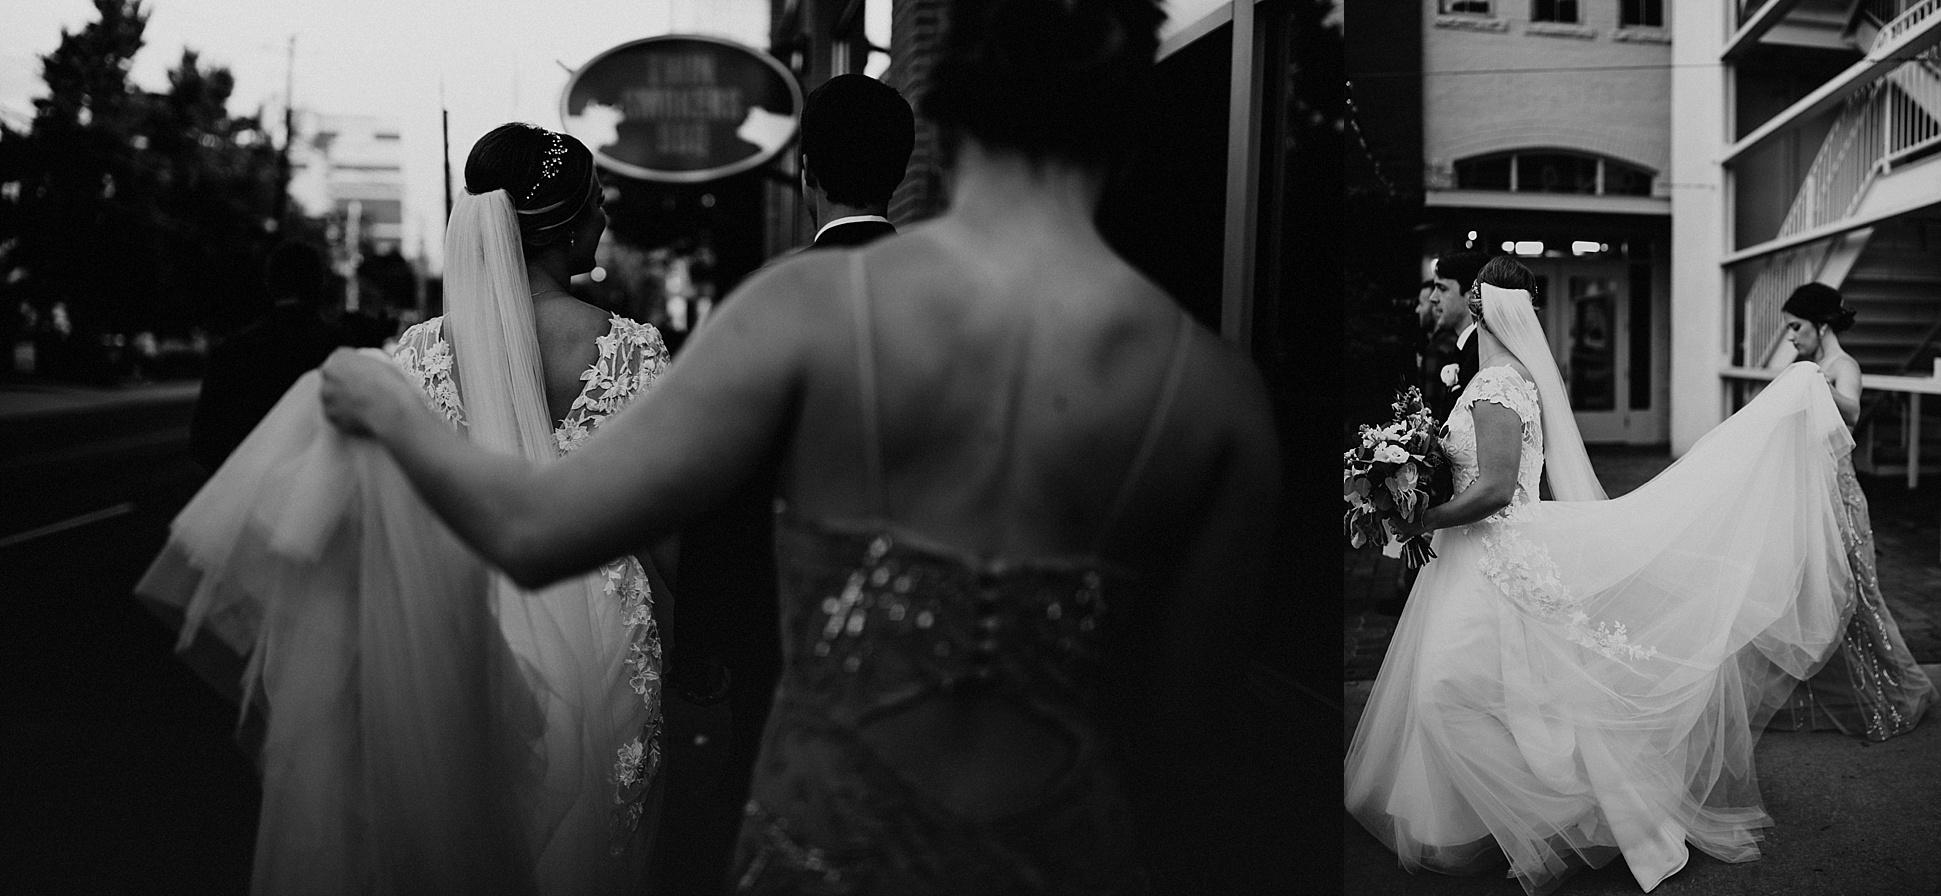 terminus_330_wedding_atlanta051.JPG